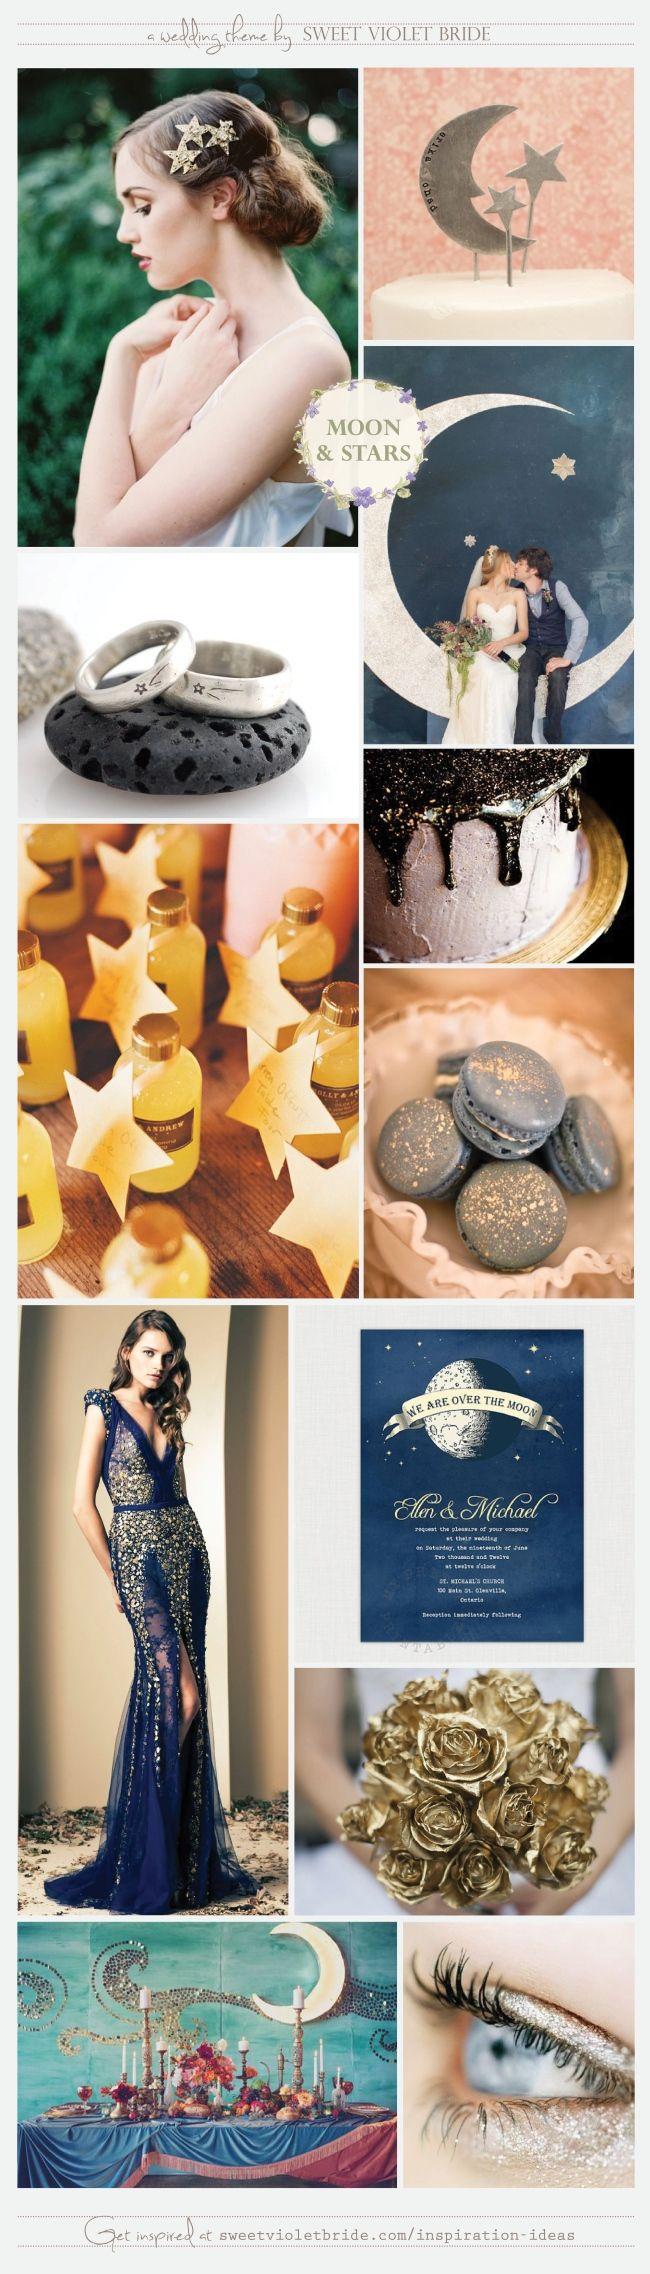 Wedding Inspiration Board - moon and stars